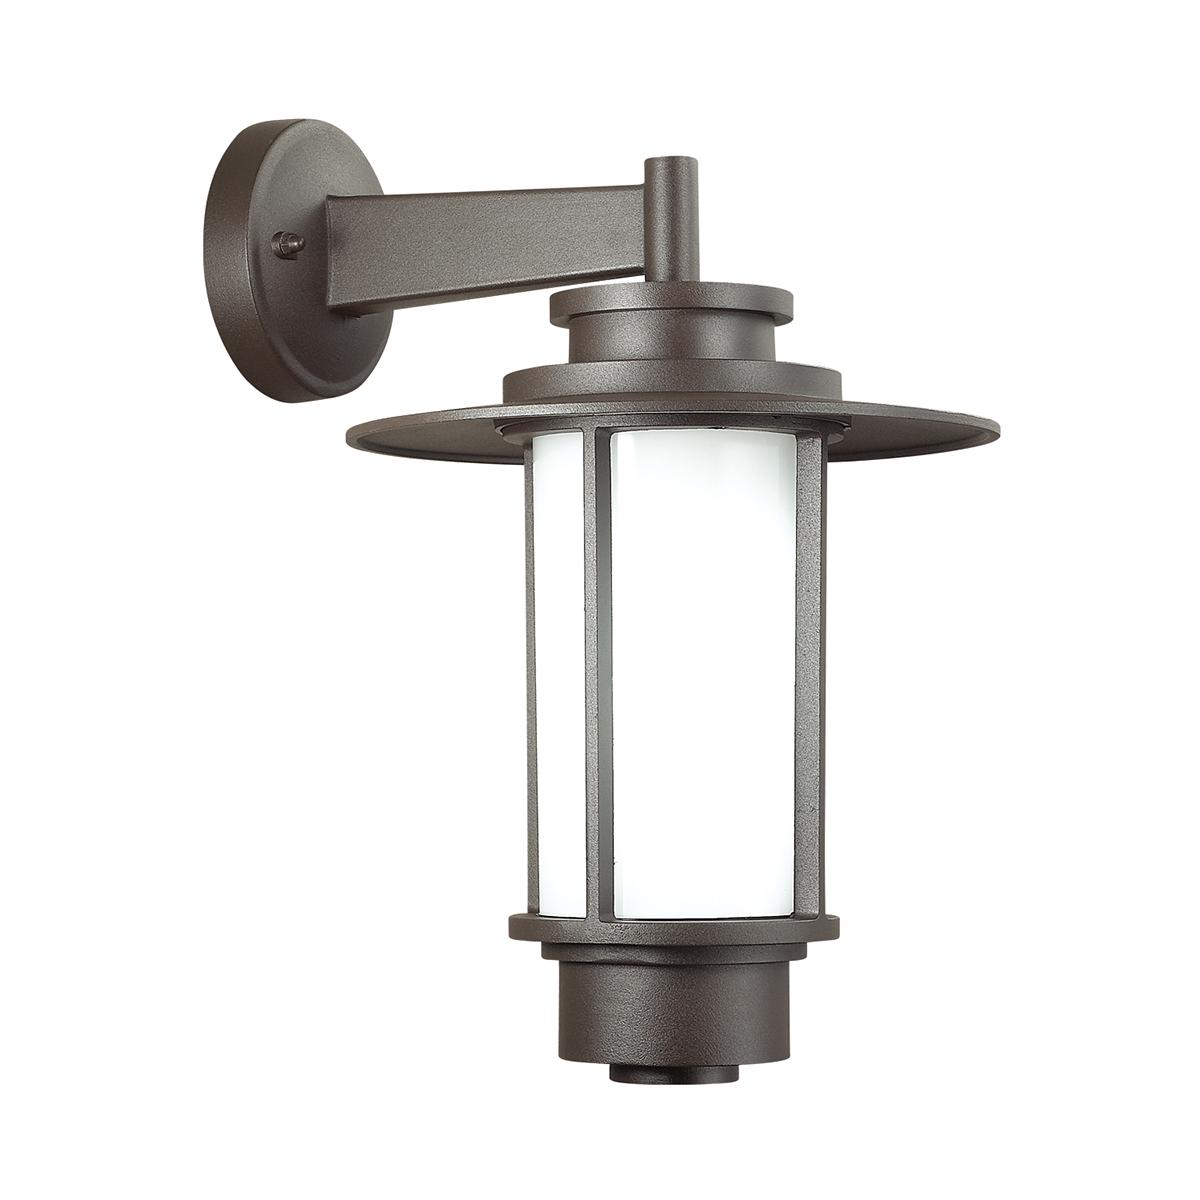 Настенный фонарь Odeon Light Nature Mito 4047/1W, IP54, 1xE27x18W, коричневый, металл, металл с пластиком - фото 1